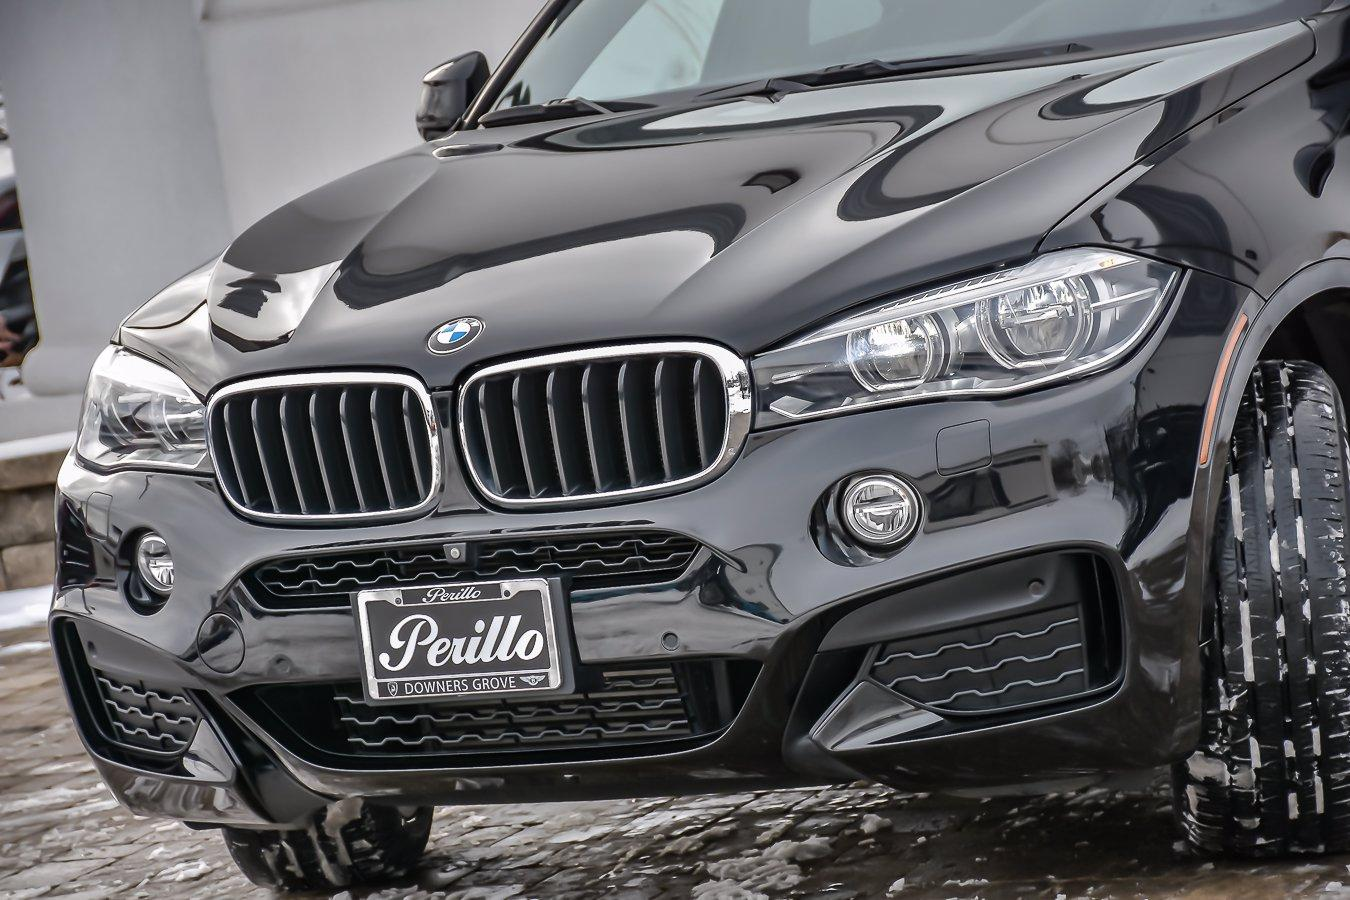 Used 2017 BMW X6 xDrive35i M-Sport Luxury Premium | Downers Grove, IL